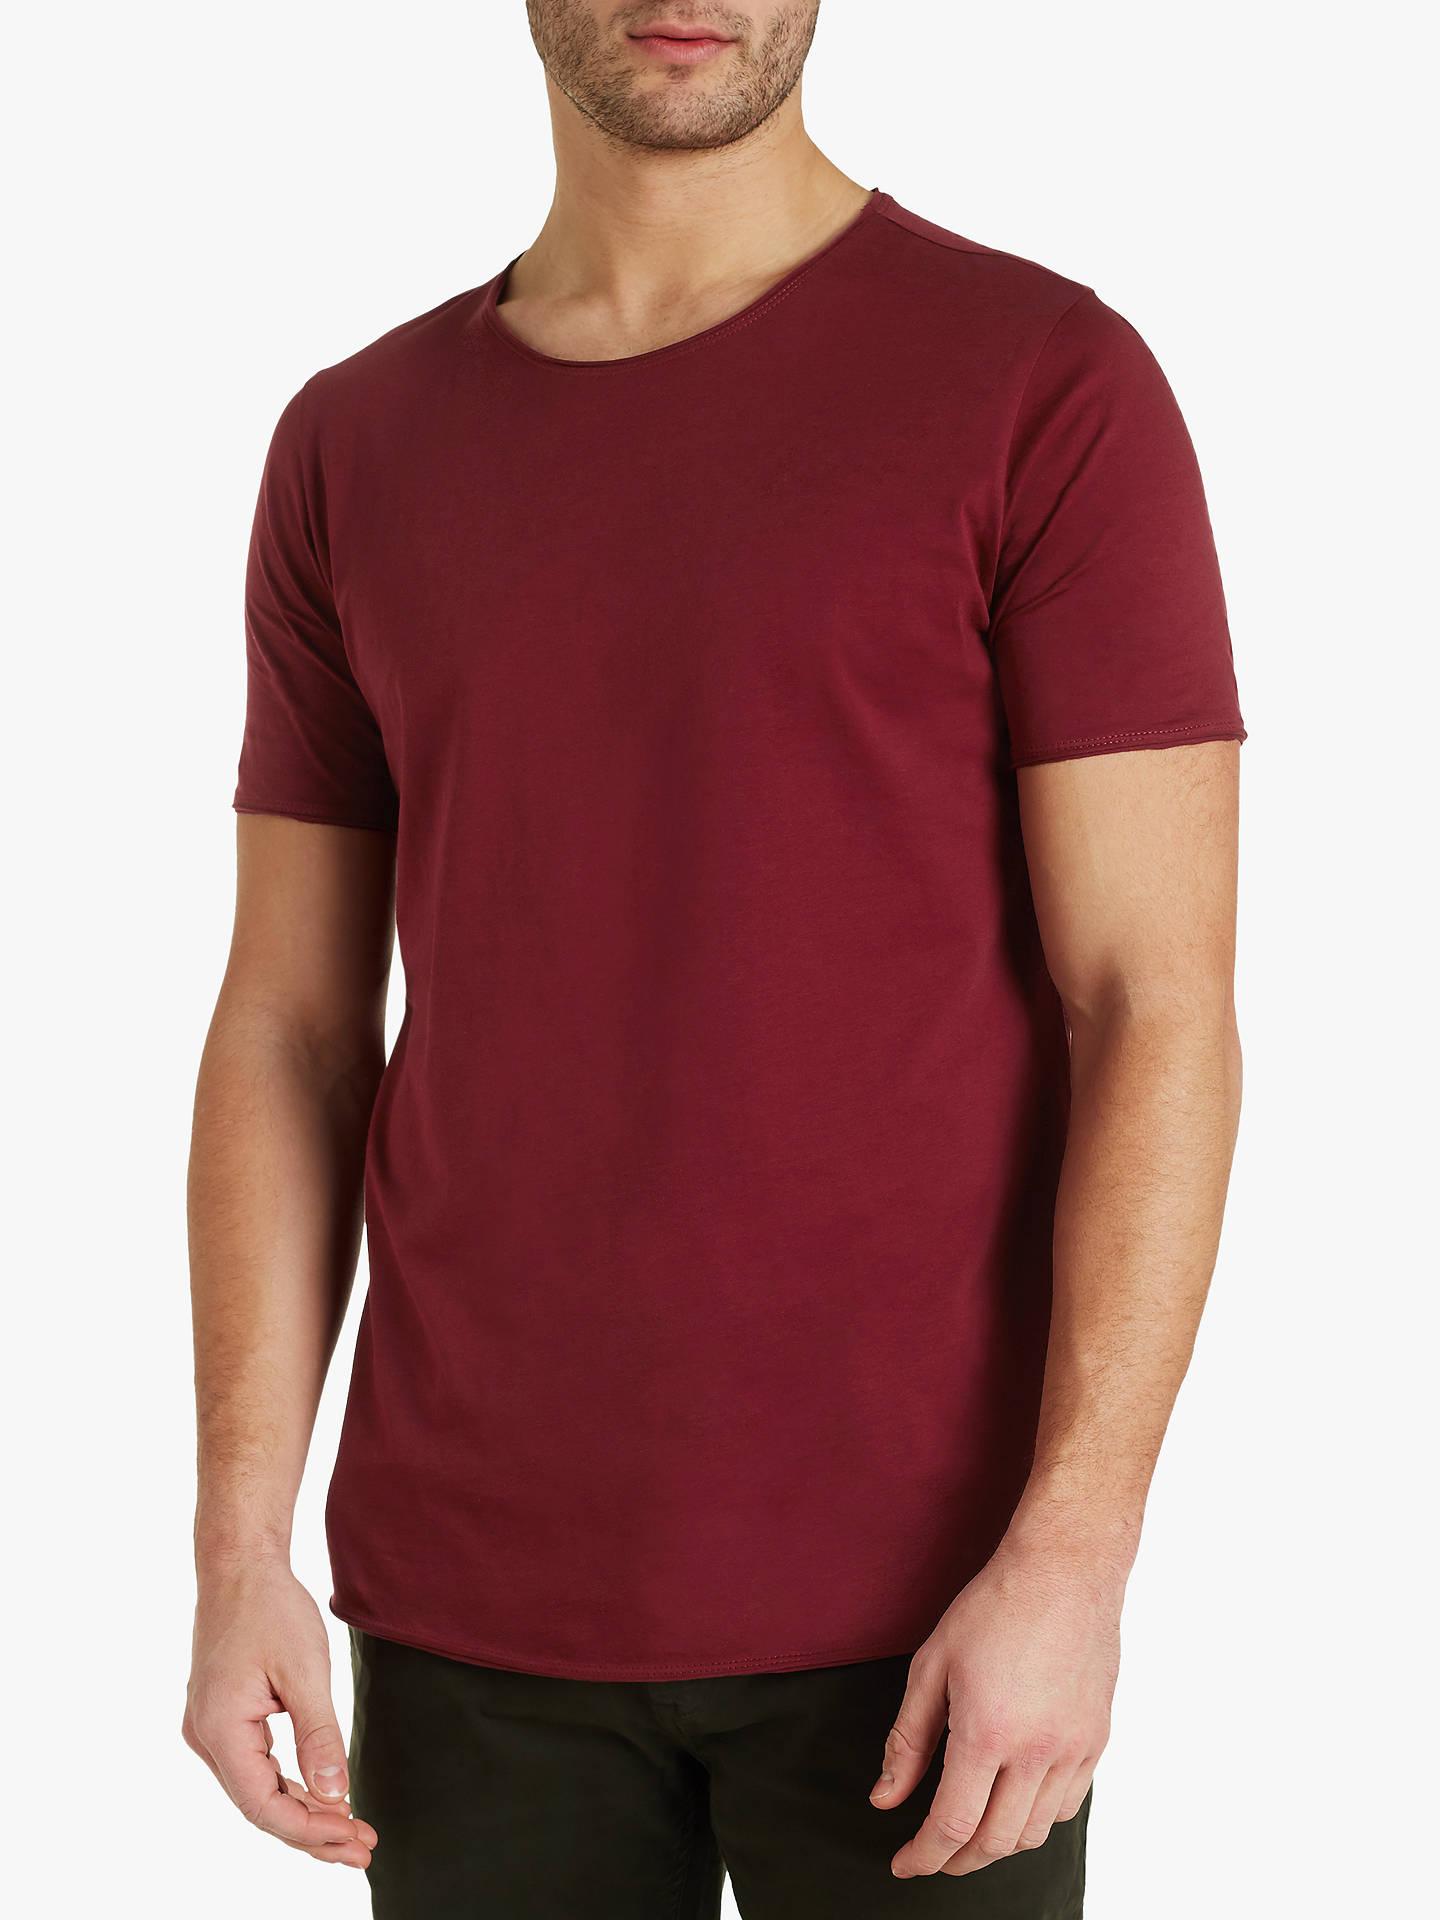 3a8ff36e50412 HUGO by Hugo Boss Depusi Pima Cotton T-Shirt at John Lewis   Partners